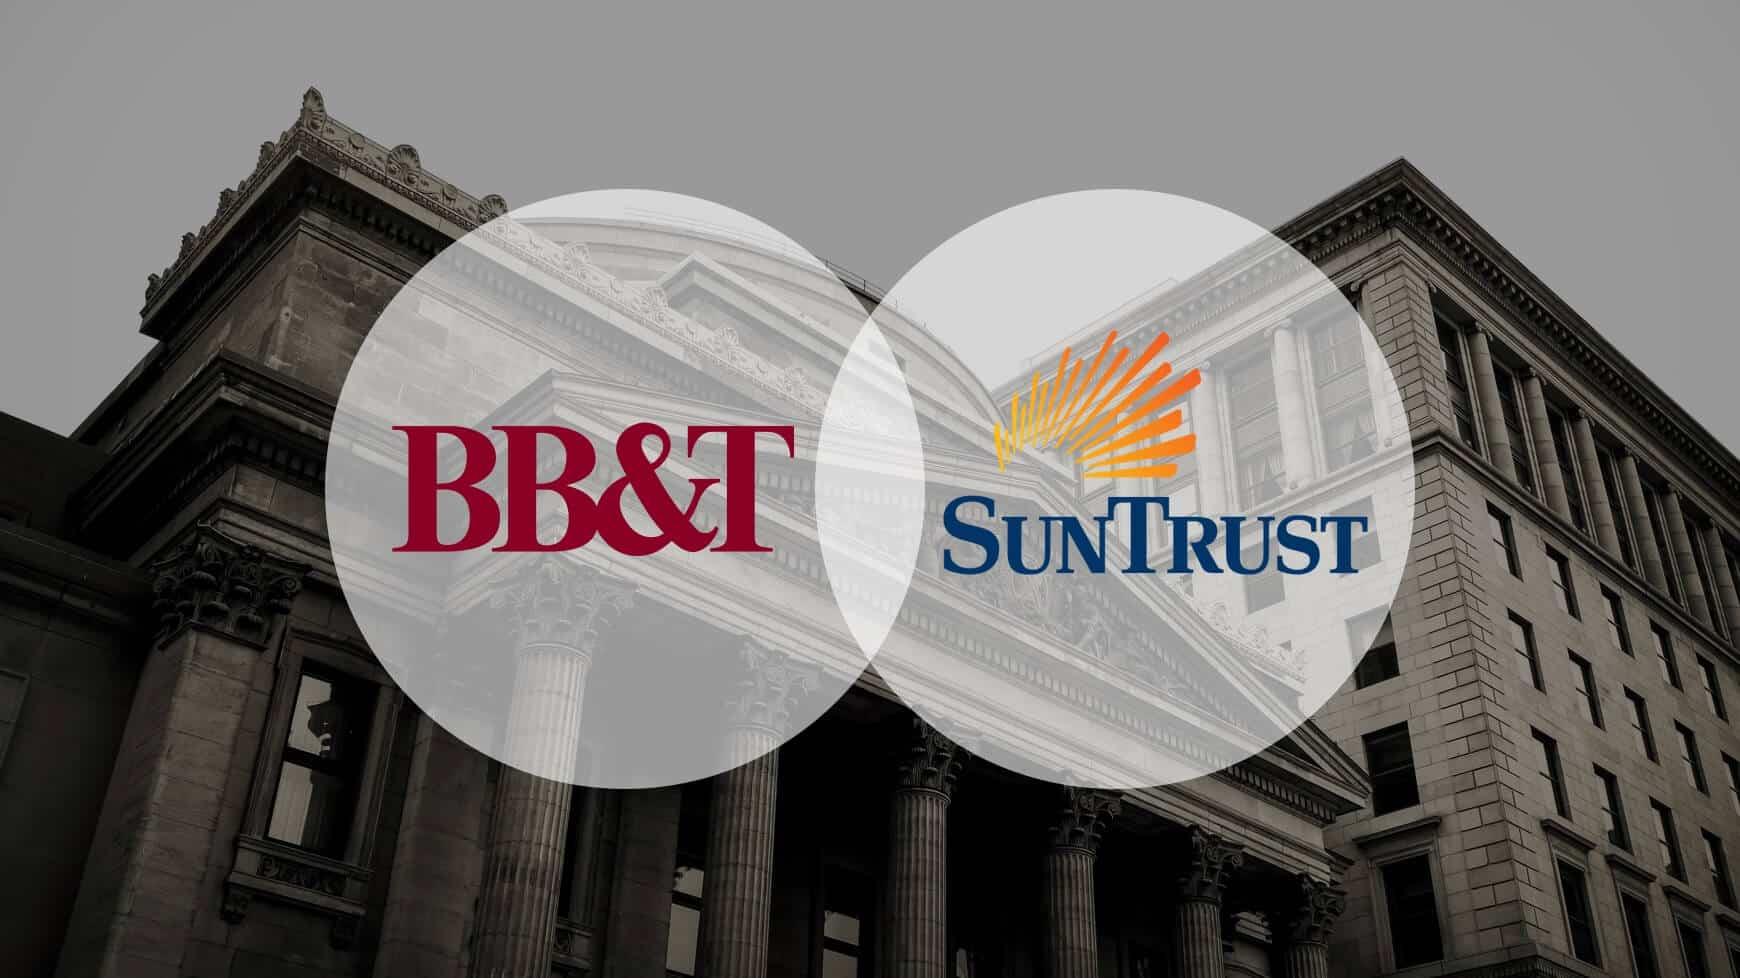 SunTrust and BB&T